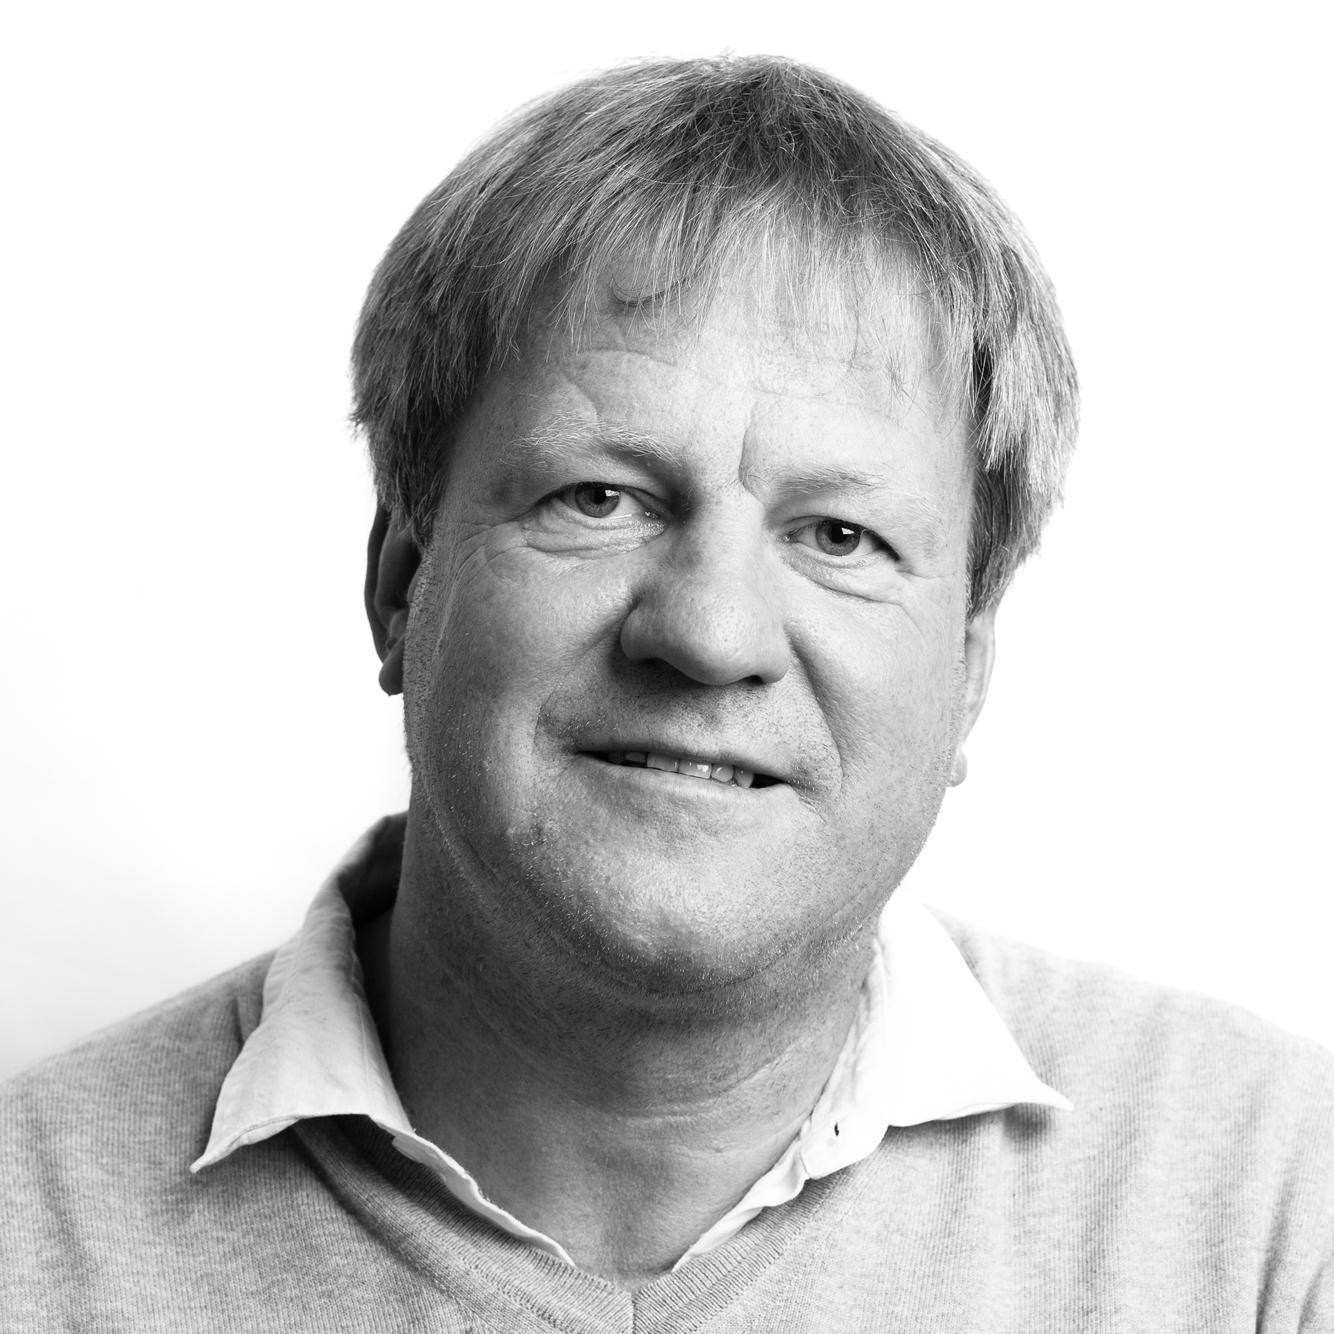 Docteur   Pierre Schepens  ,  Médecin chef de site